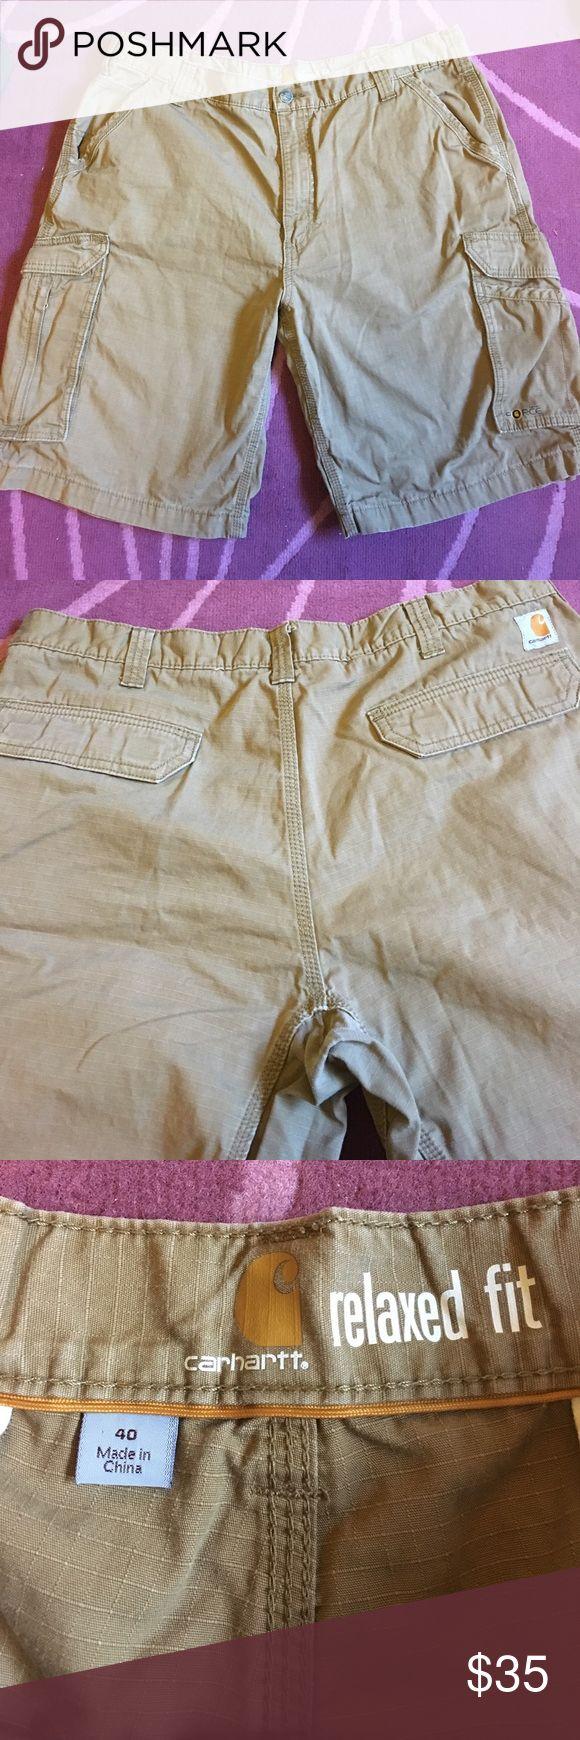 Men's Carhartt Cargo Shorts Dark tan relaxed fit Carhartt cargo shorts. In perfect condition. Size 40 Carhartt Shorts Cargo